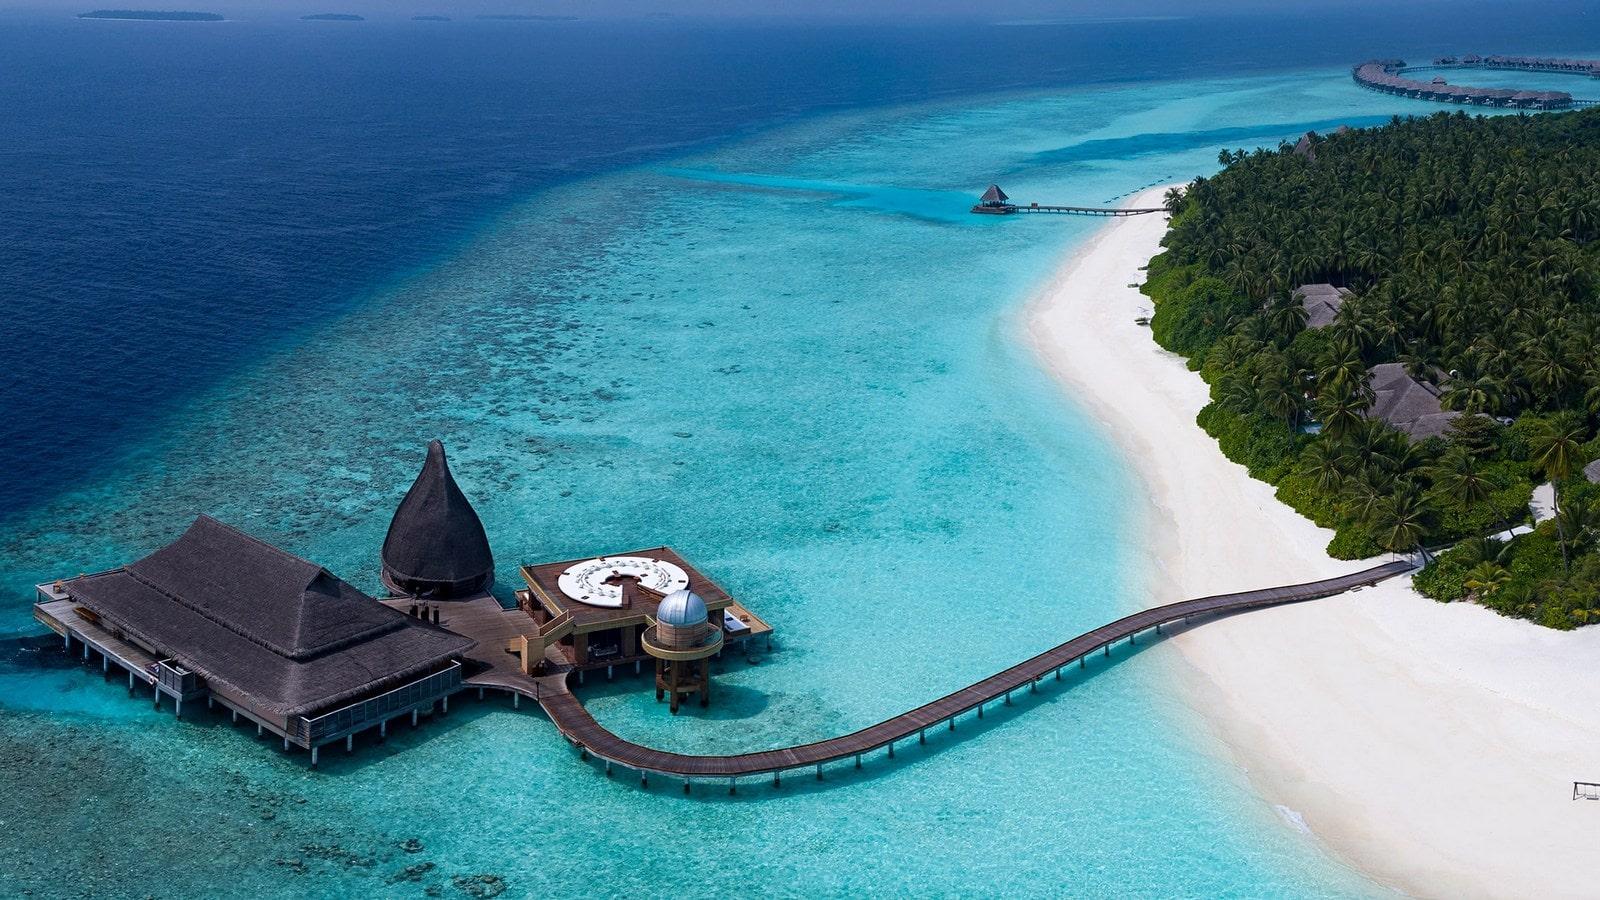 Мальдивы, отель Anantara Kihavah Maldives Villas